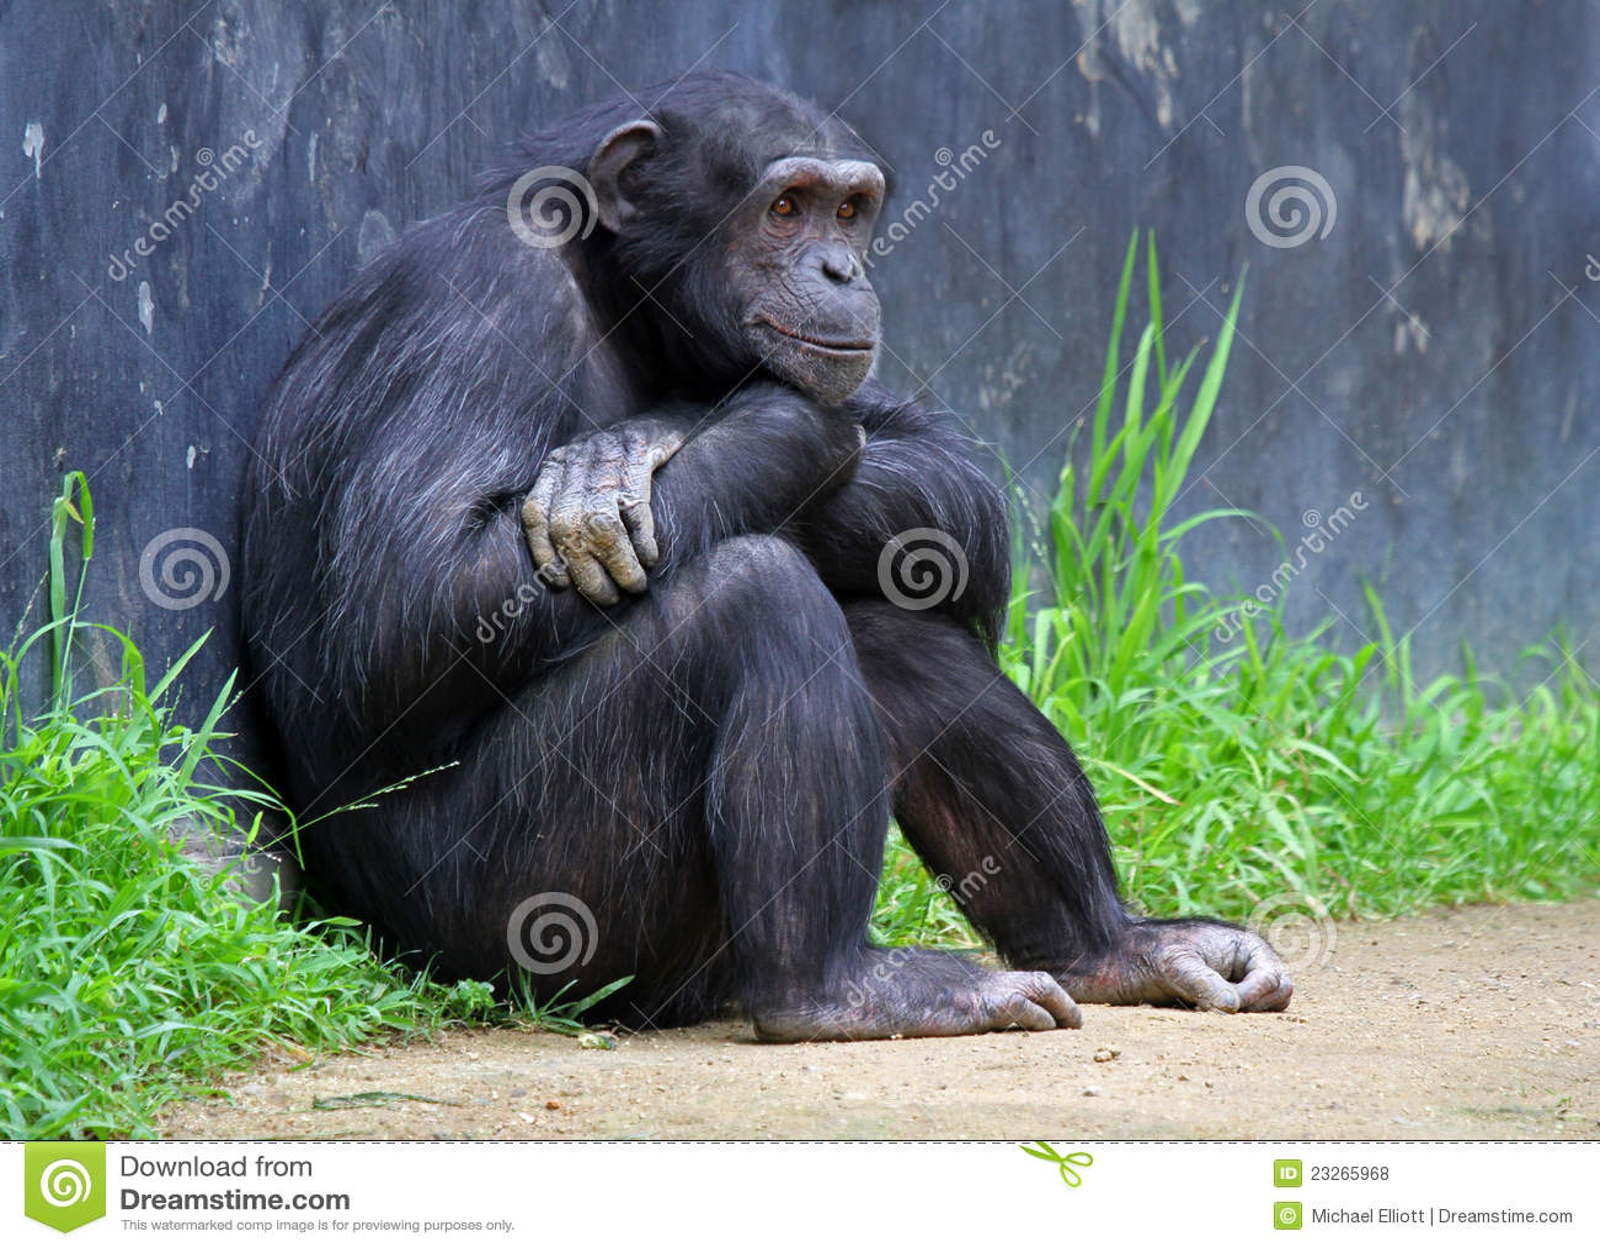 chimpanzee skull diagram 98 honda accord alarm wiring body get free image about